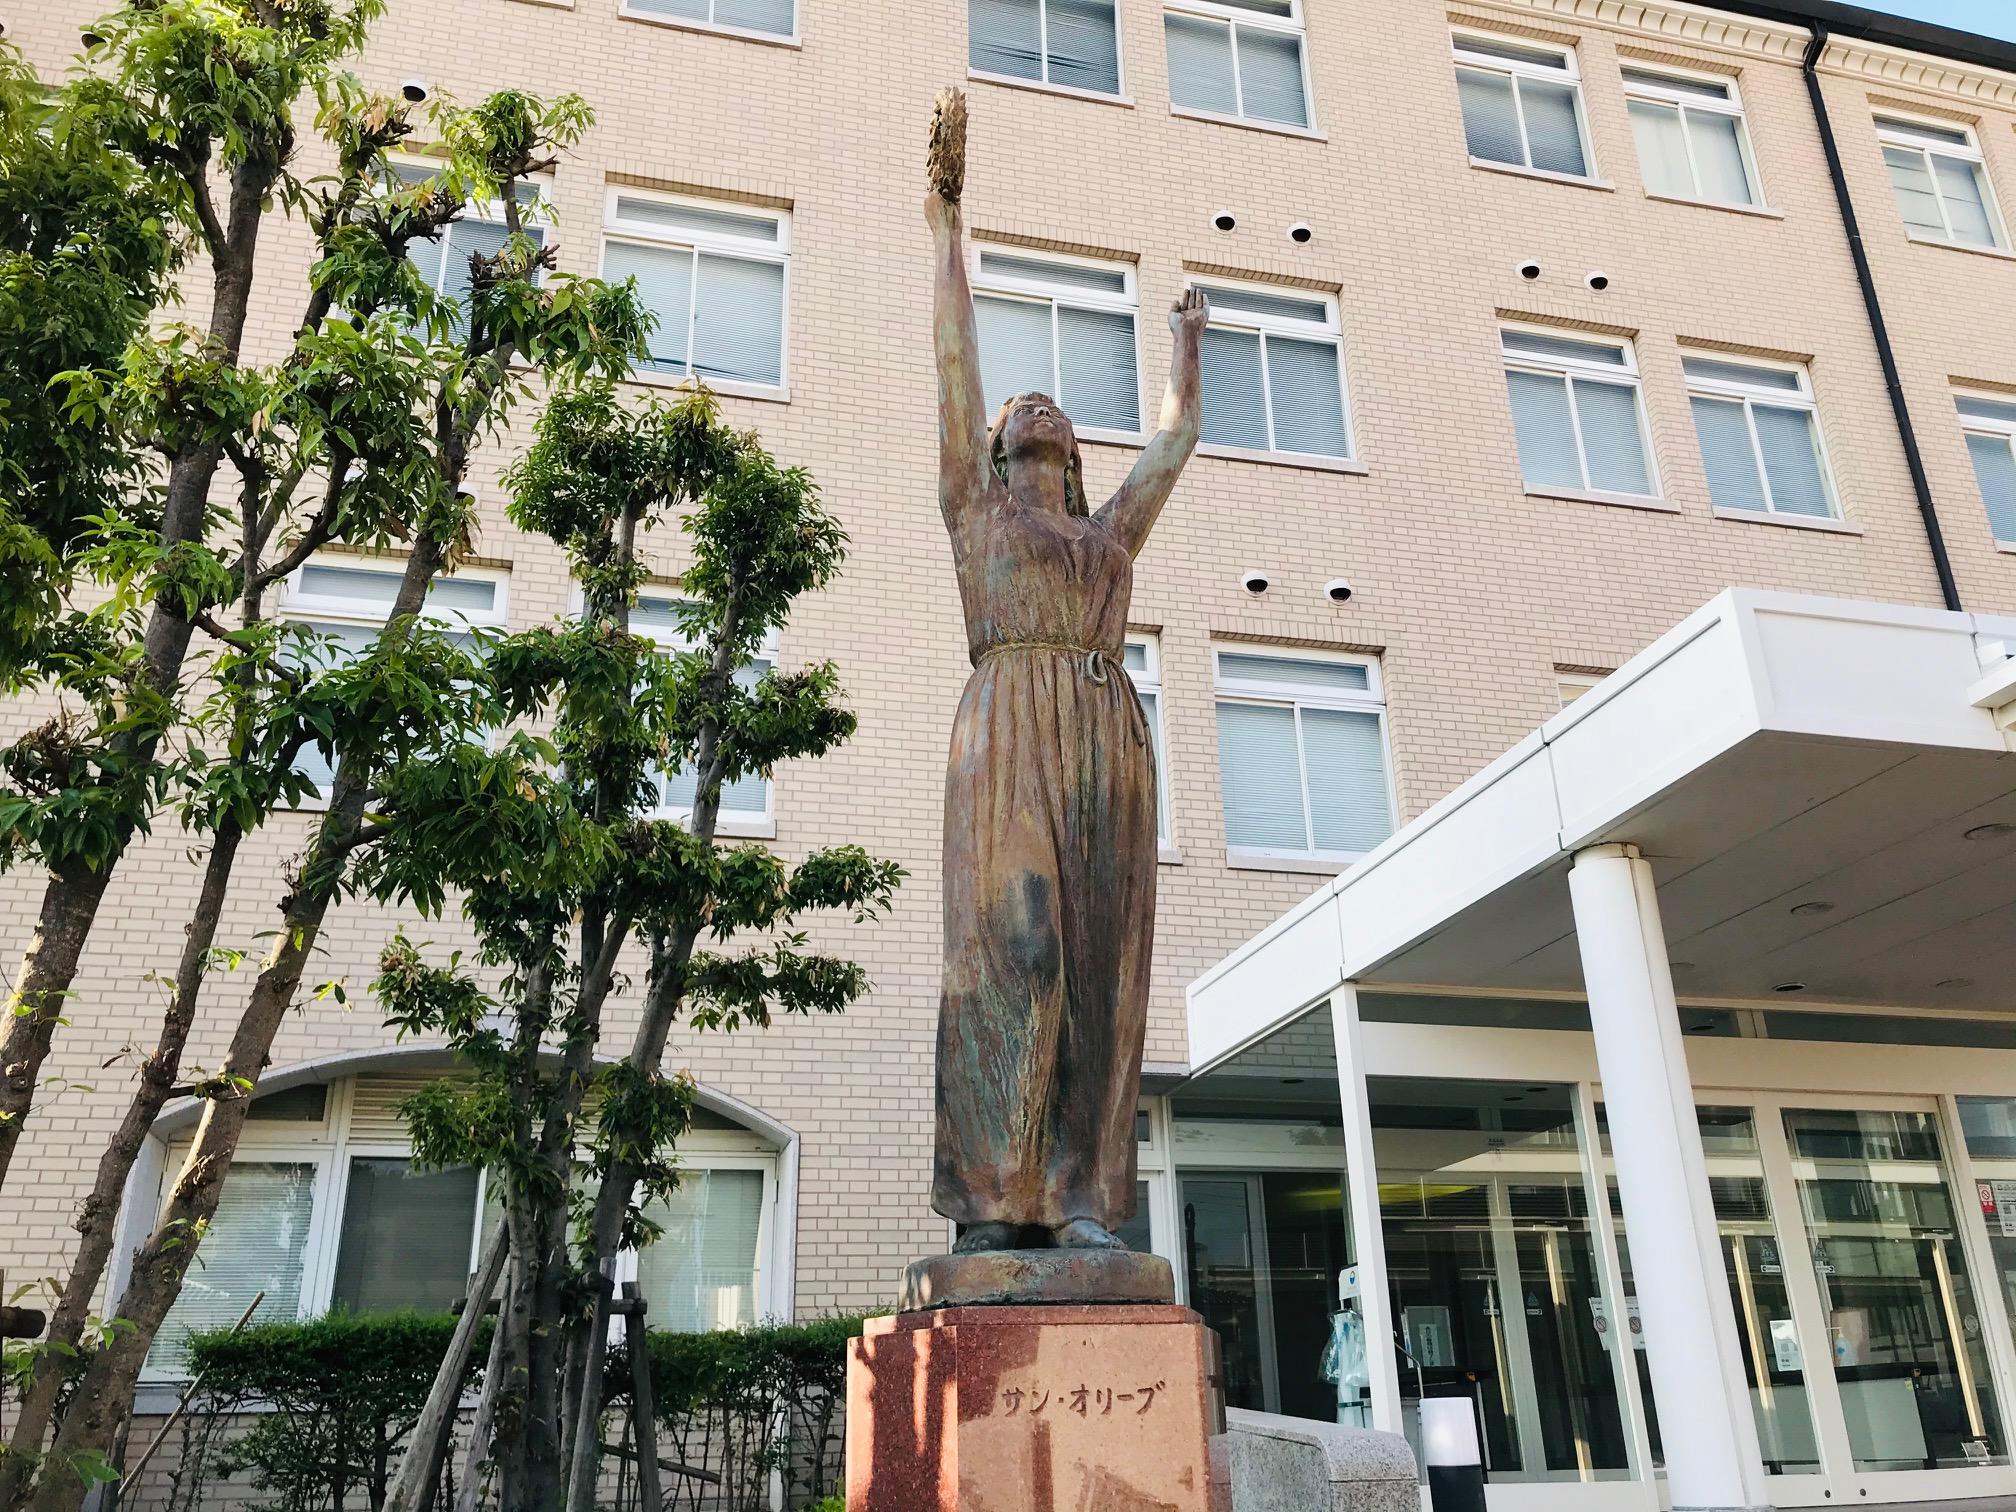 サン・オリーブ兵庫栄養調理製菓専門学校